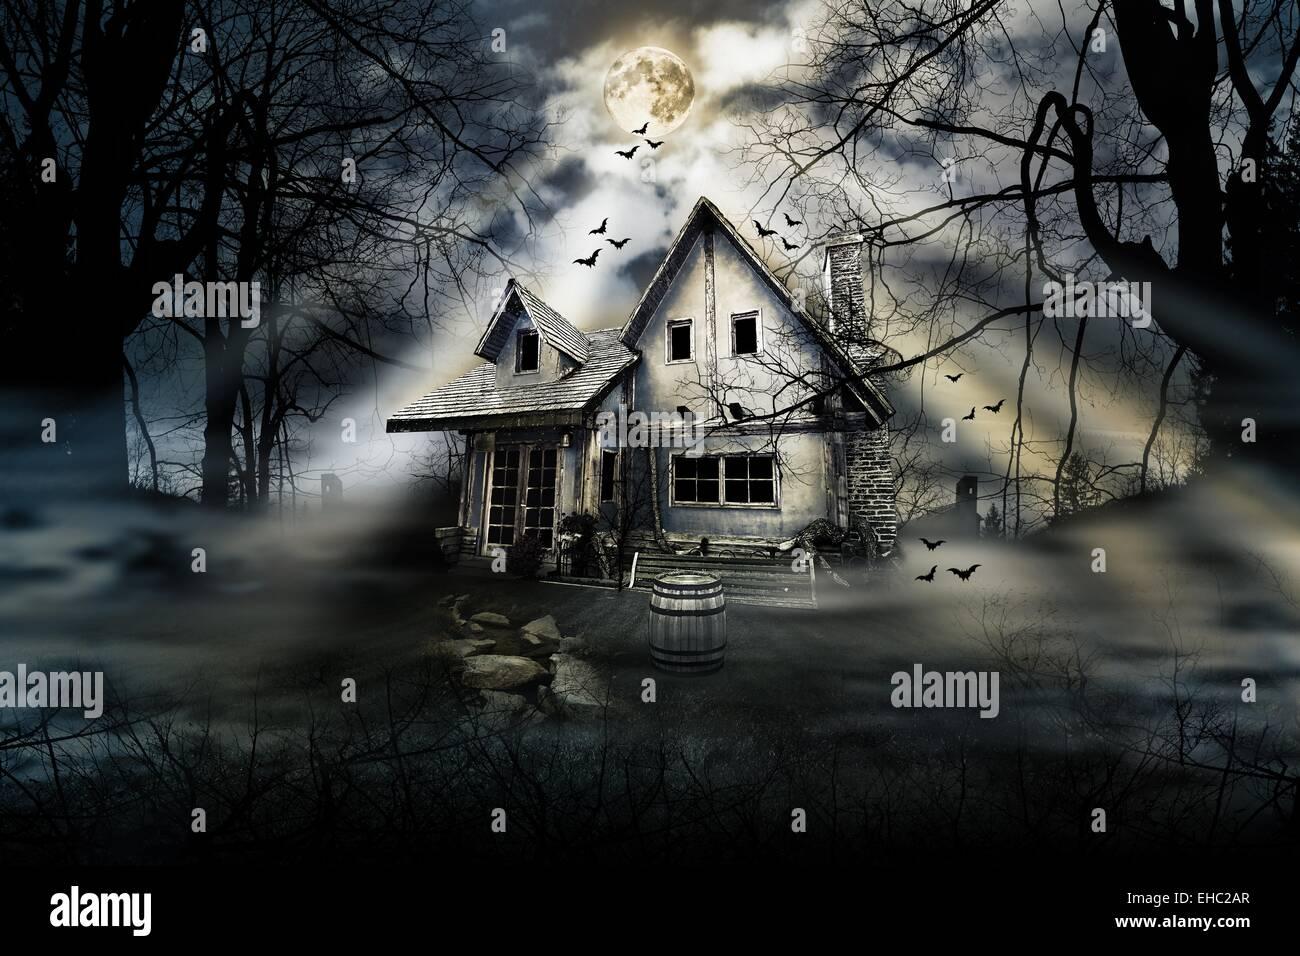 Haunted House con atmósfera de miedo terror oscuro Imagen De Stock